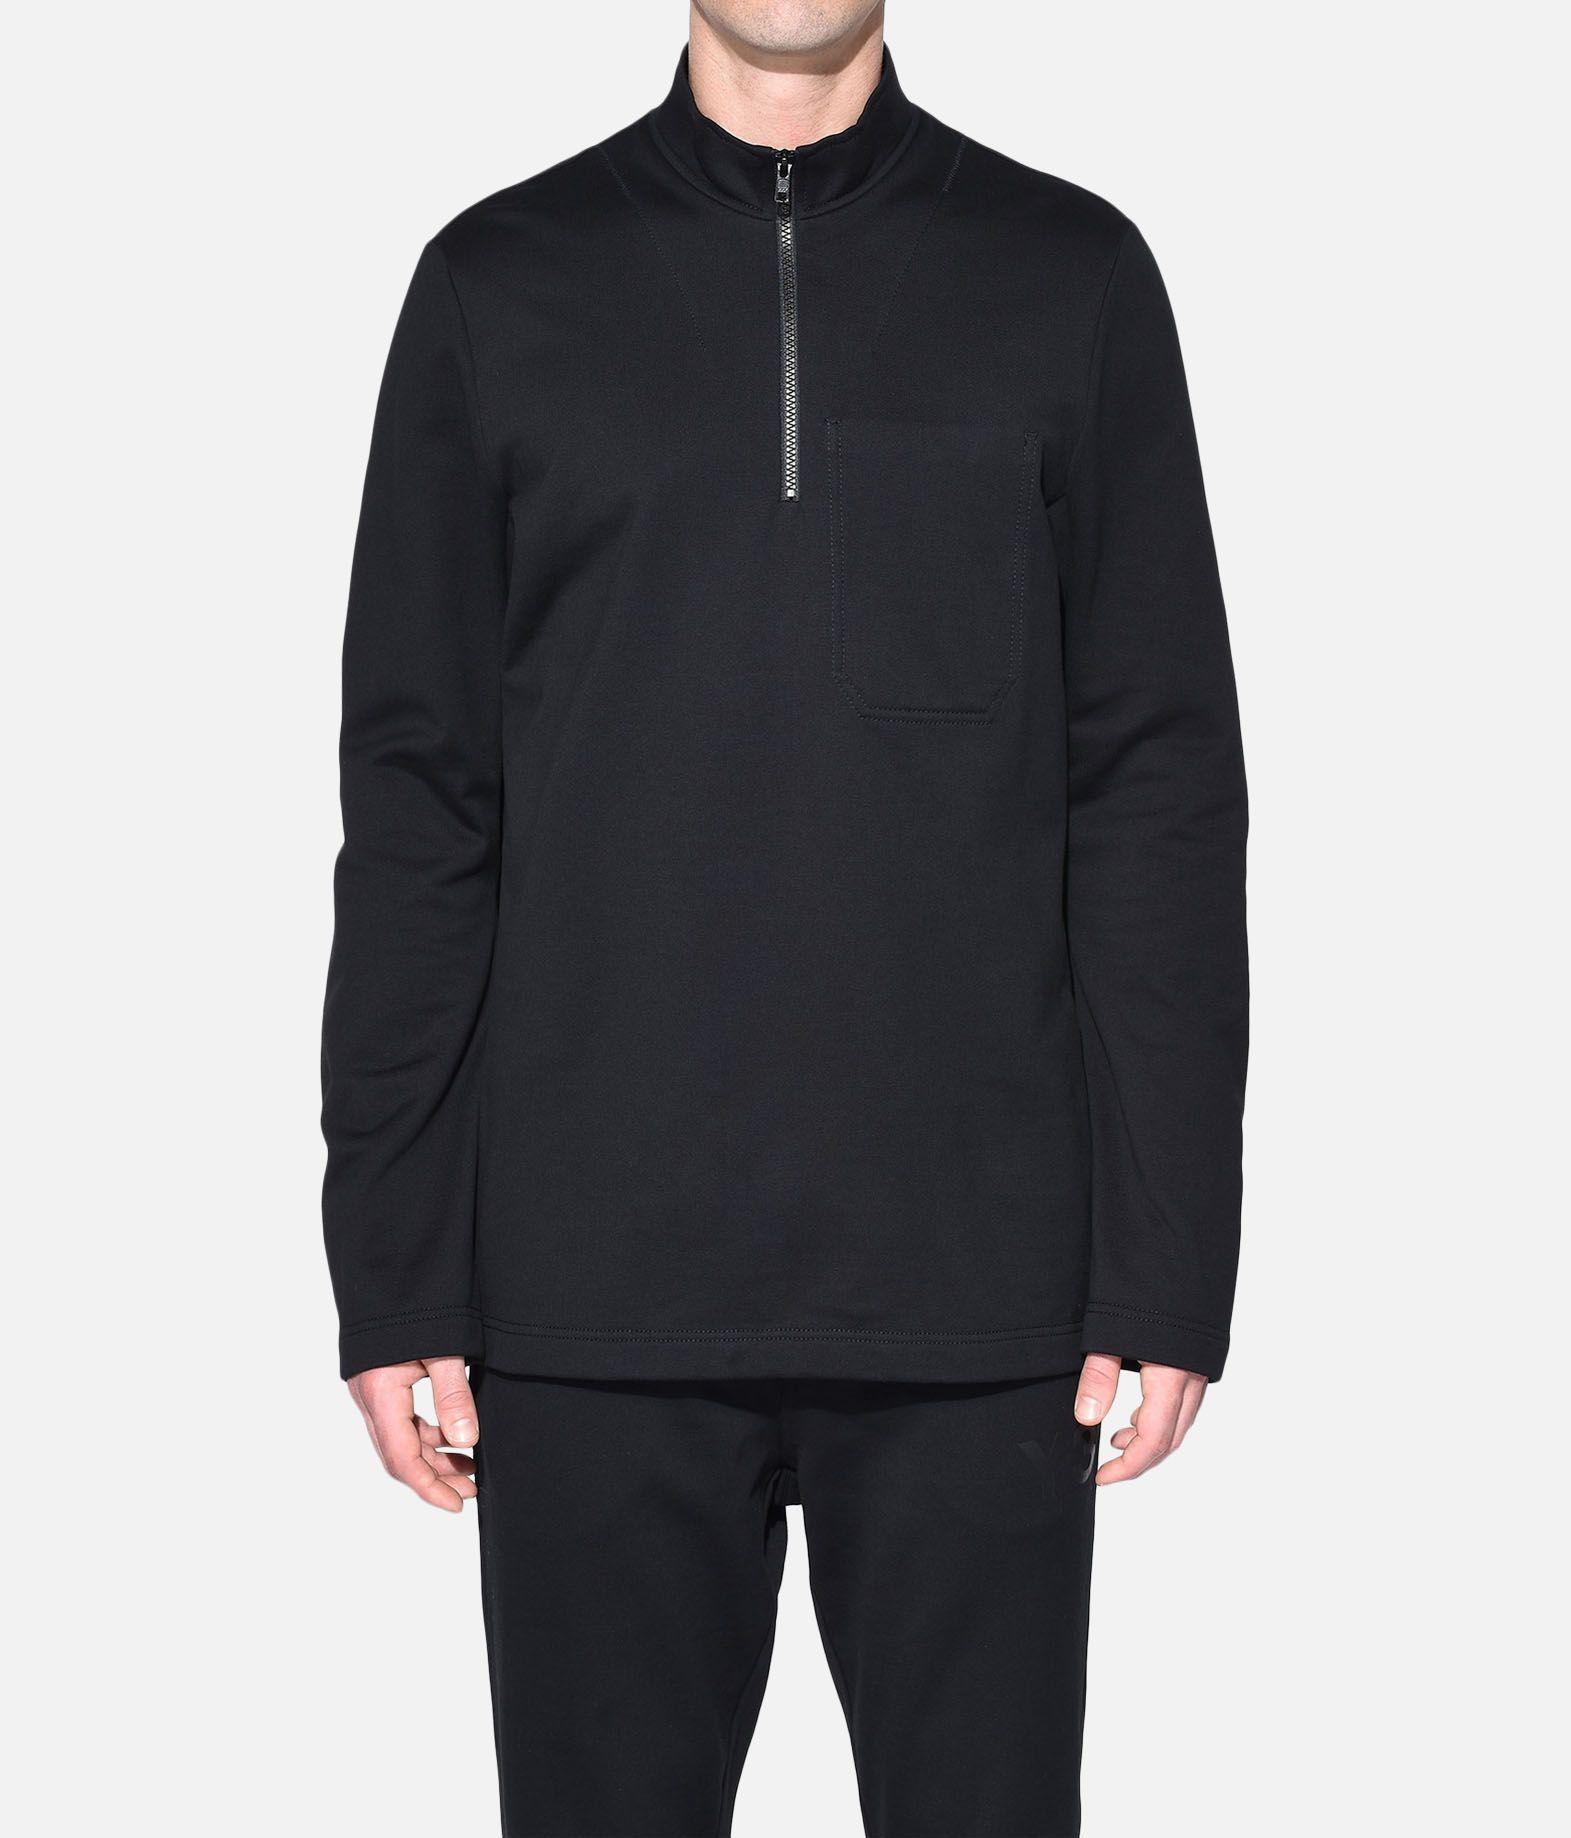 Y-3 Y-3 Sashiko Sweater スウェットブルゾン メンズ r